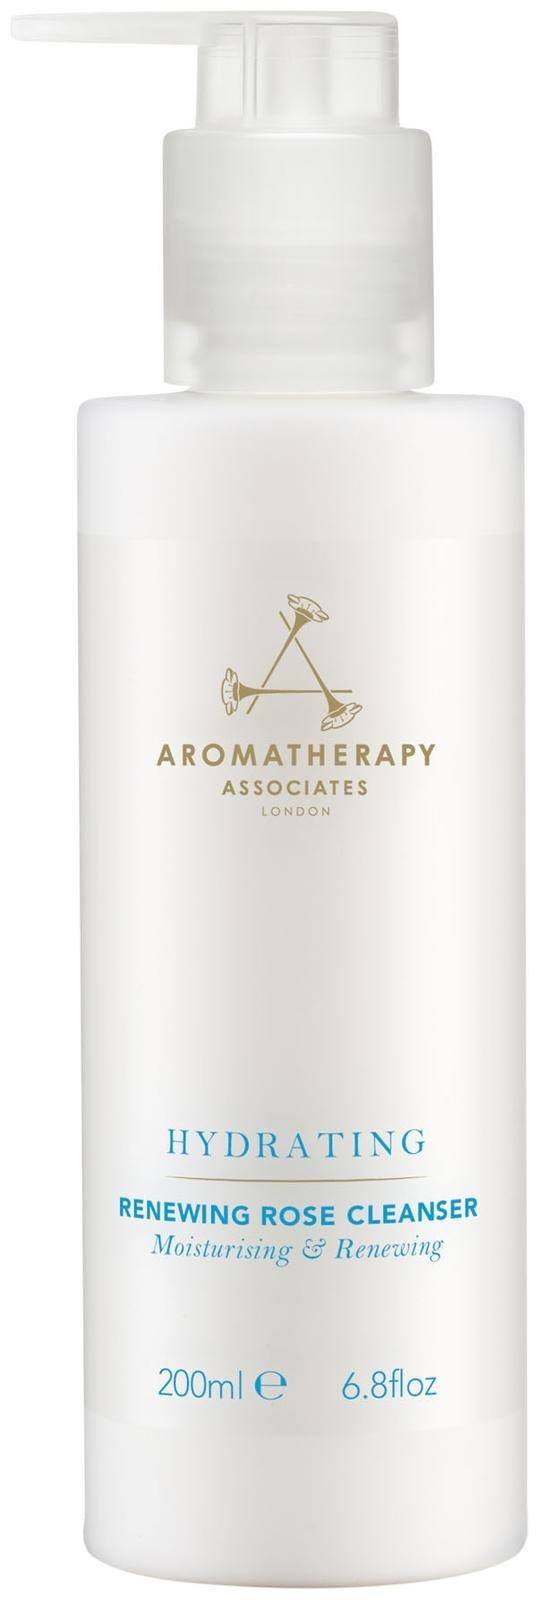 Aromatherapy Associates Essential Skincare Renewing Rose Cleanser